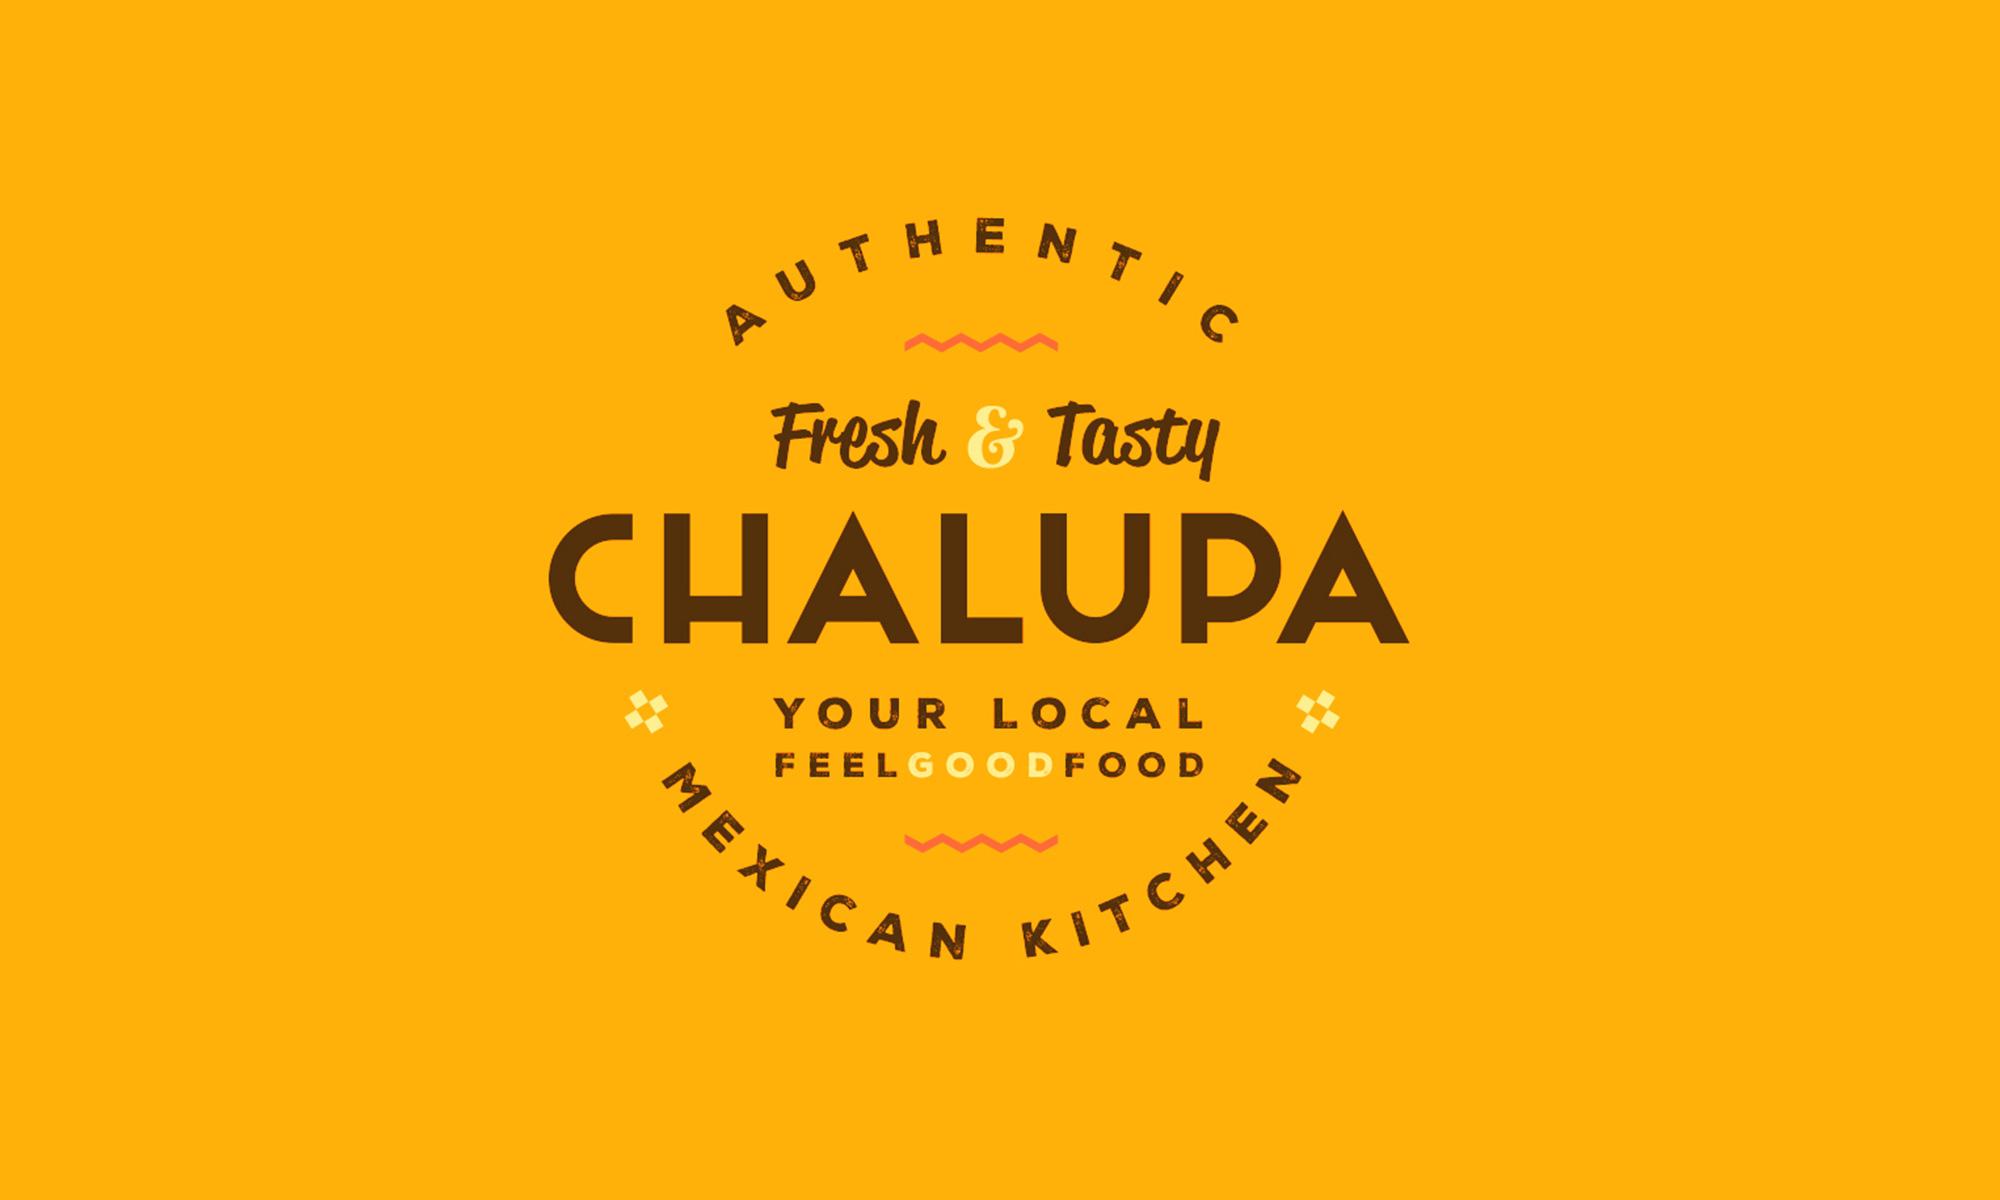 Chalupa - Fresh & Tasty